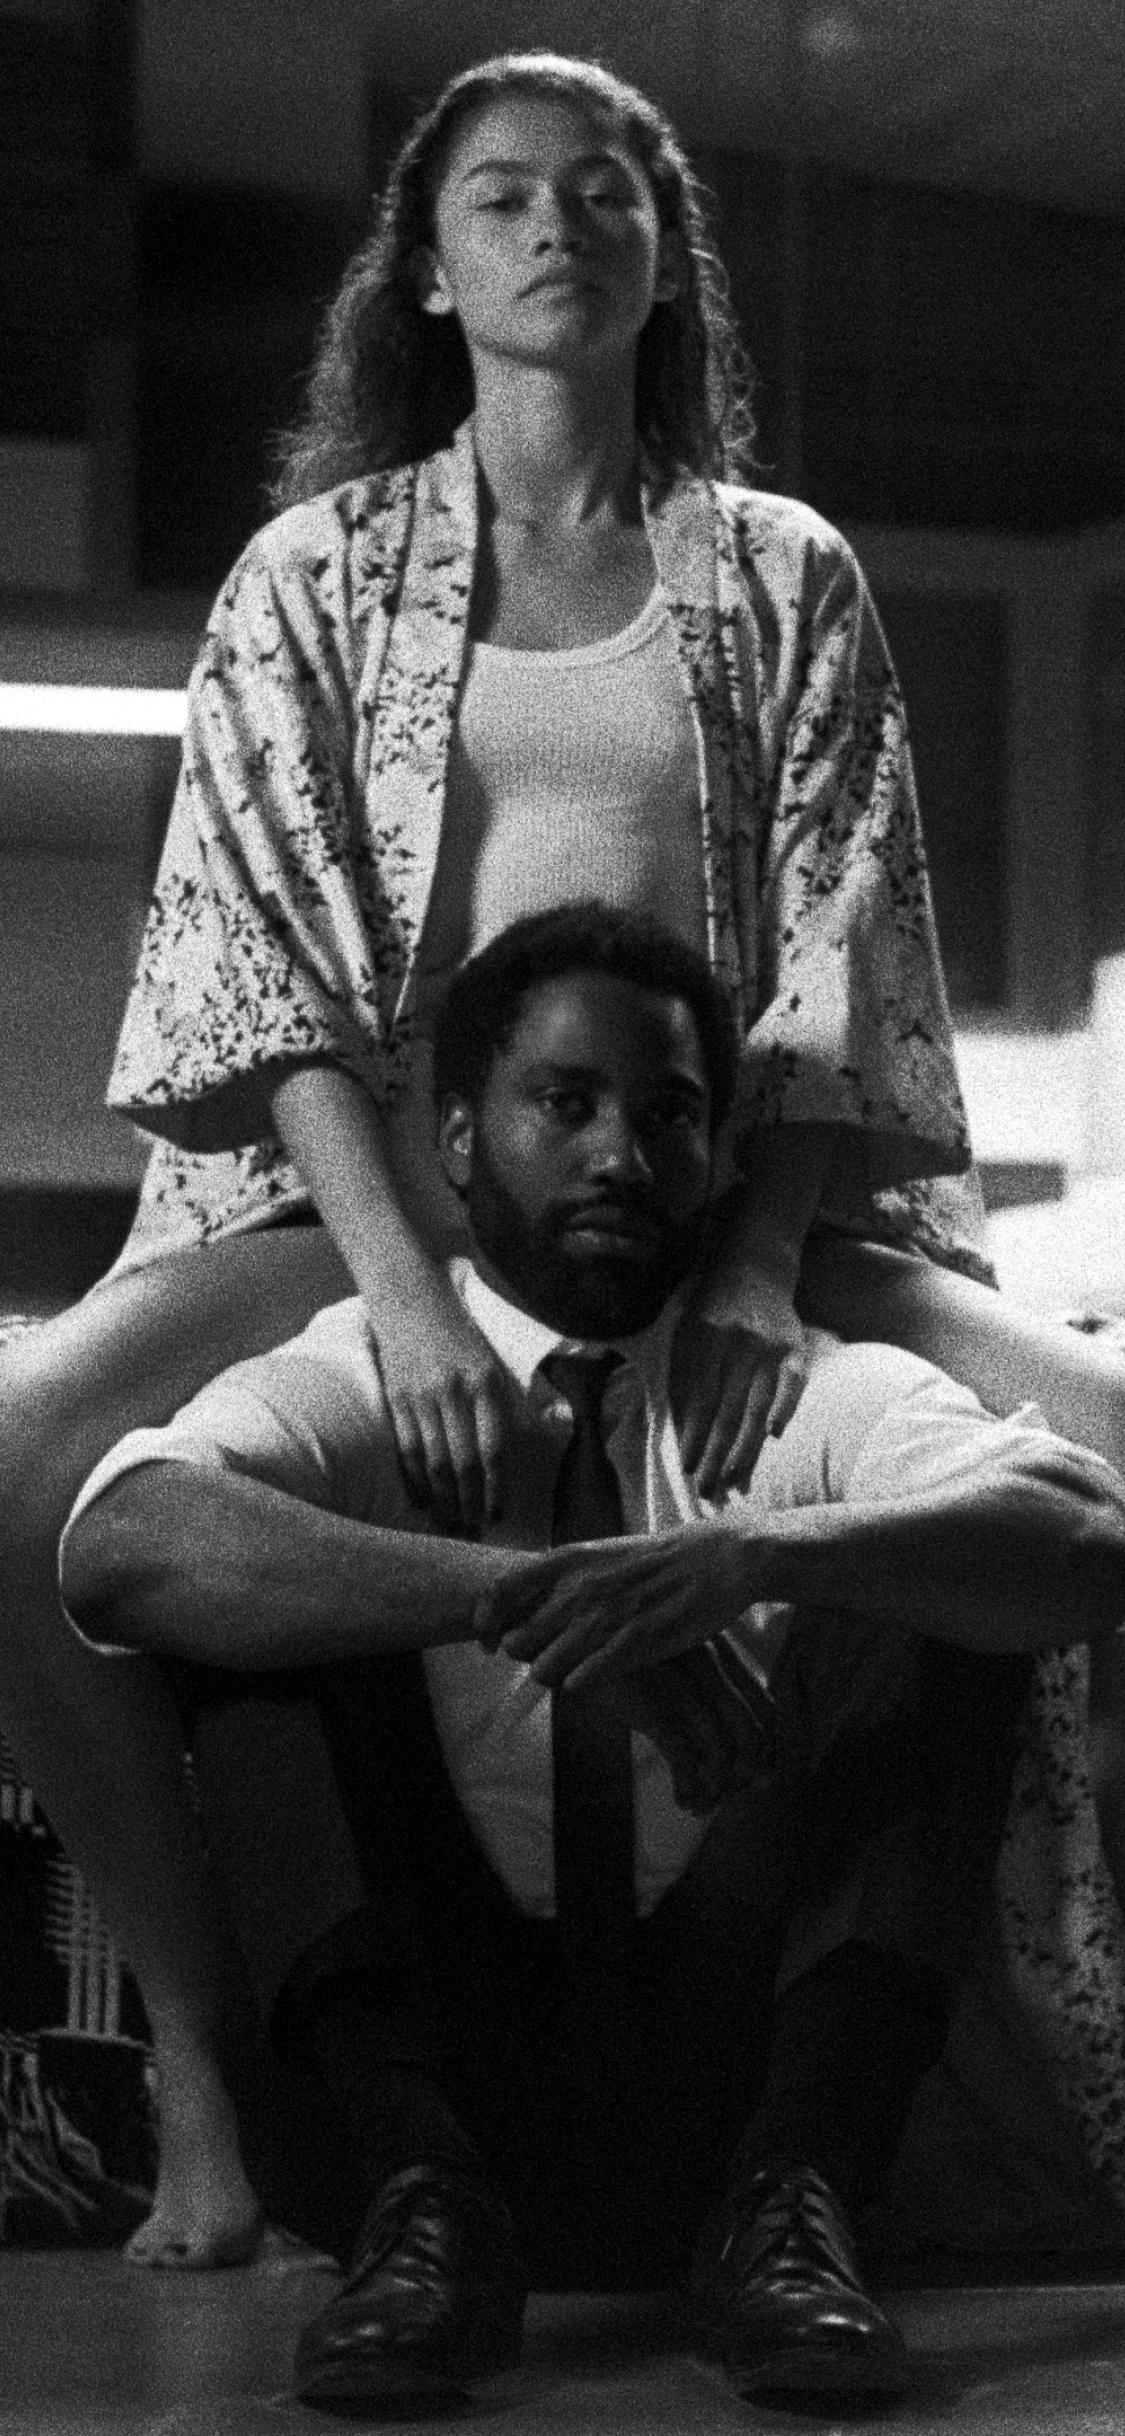 Zendaya & John Washington from Malcolm & Marie Wallpaper in 1125x2436 Resolution